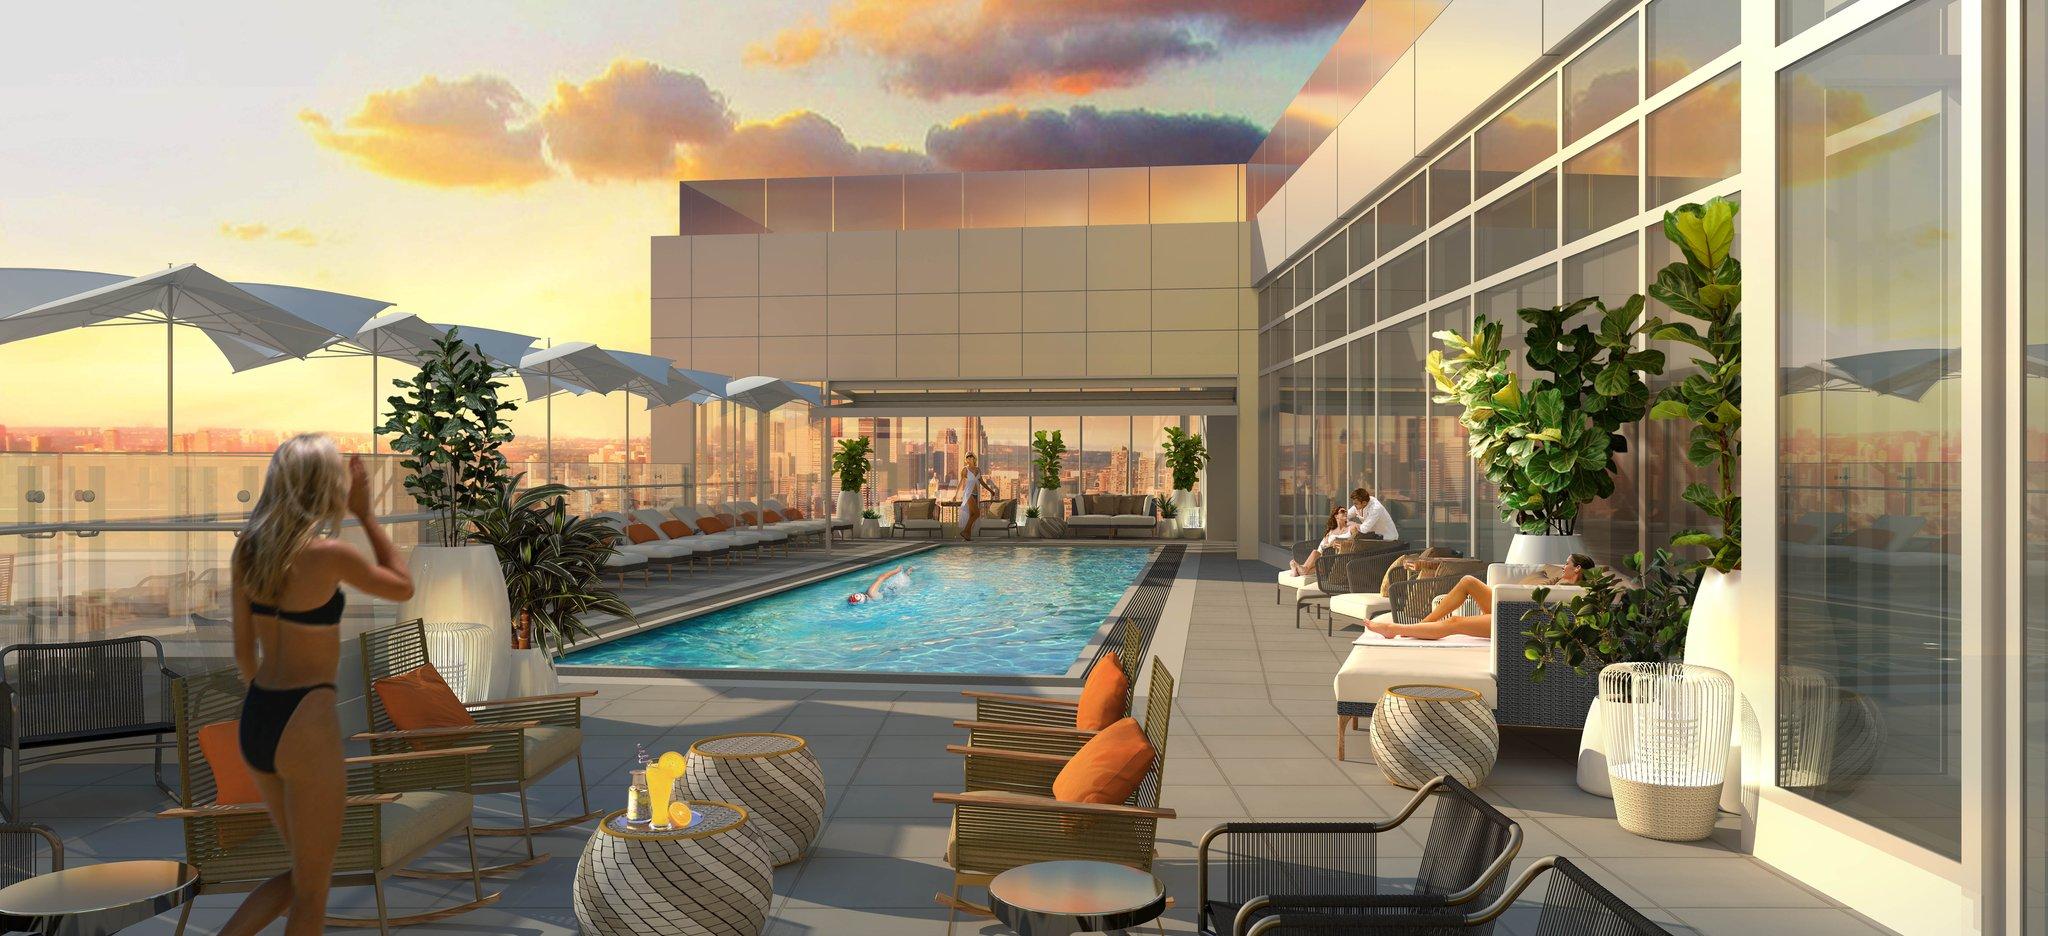 Hotel X Toronto_Falcon SkyBar Pool.jpg